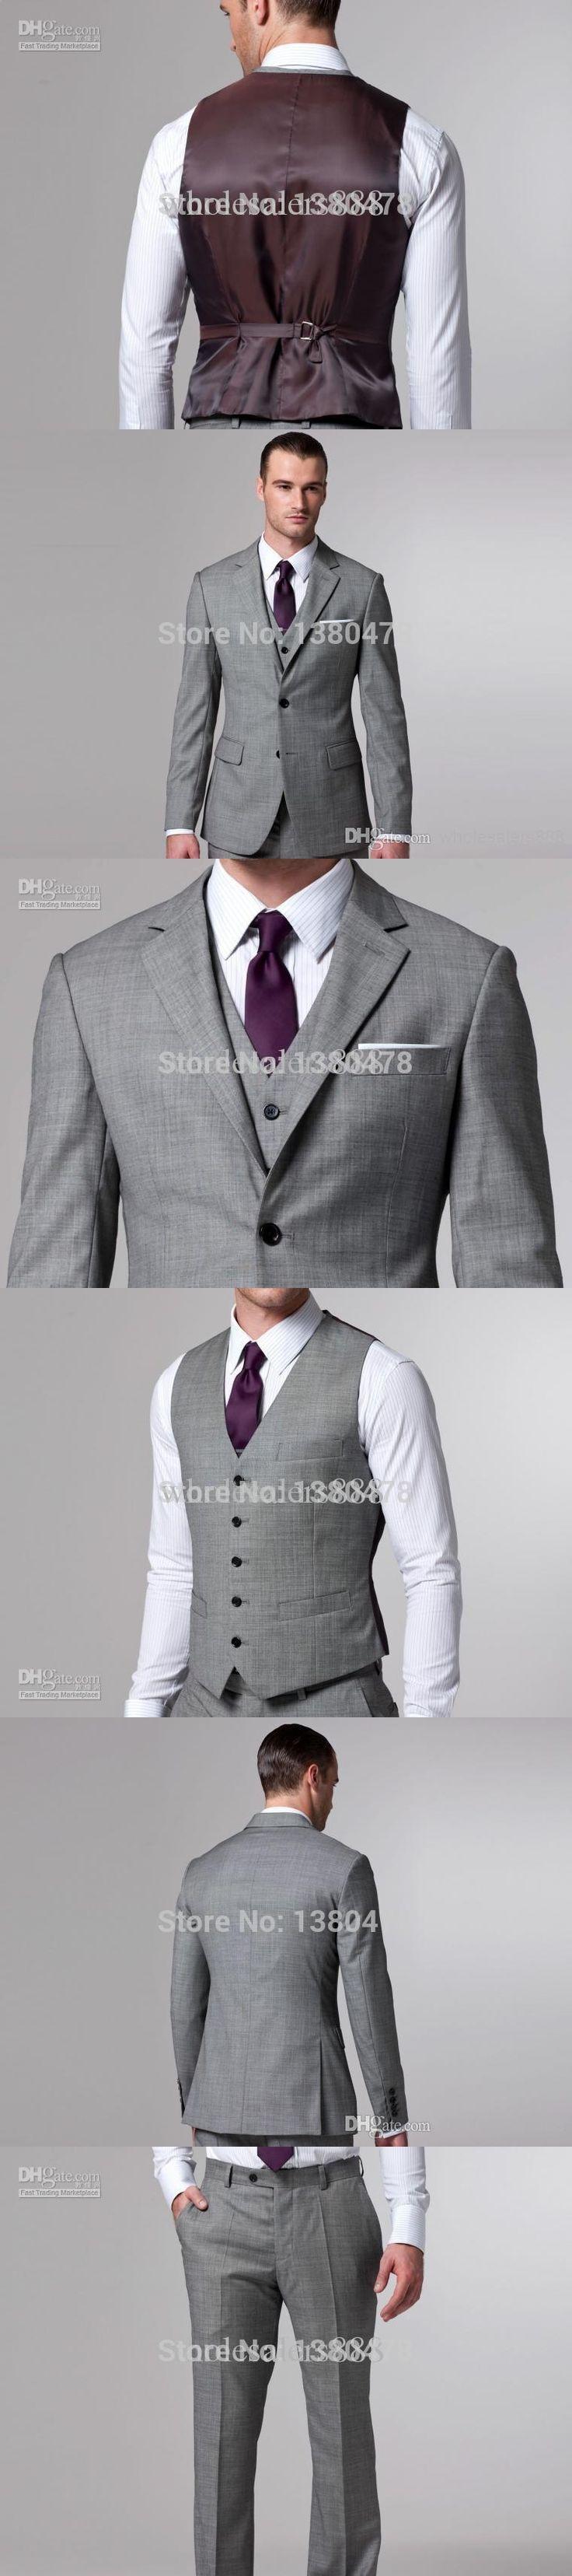 2016 - New Custom Design Notch Lapel Groom Tuxedos Wool Blend Best Man Suits (Jacket+Pants+Tie+Vest) G578